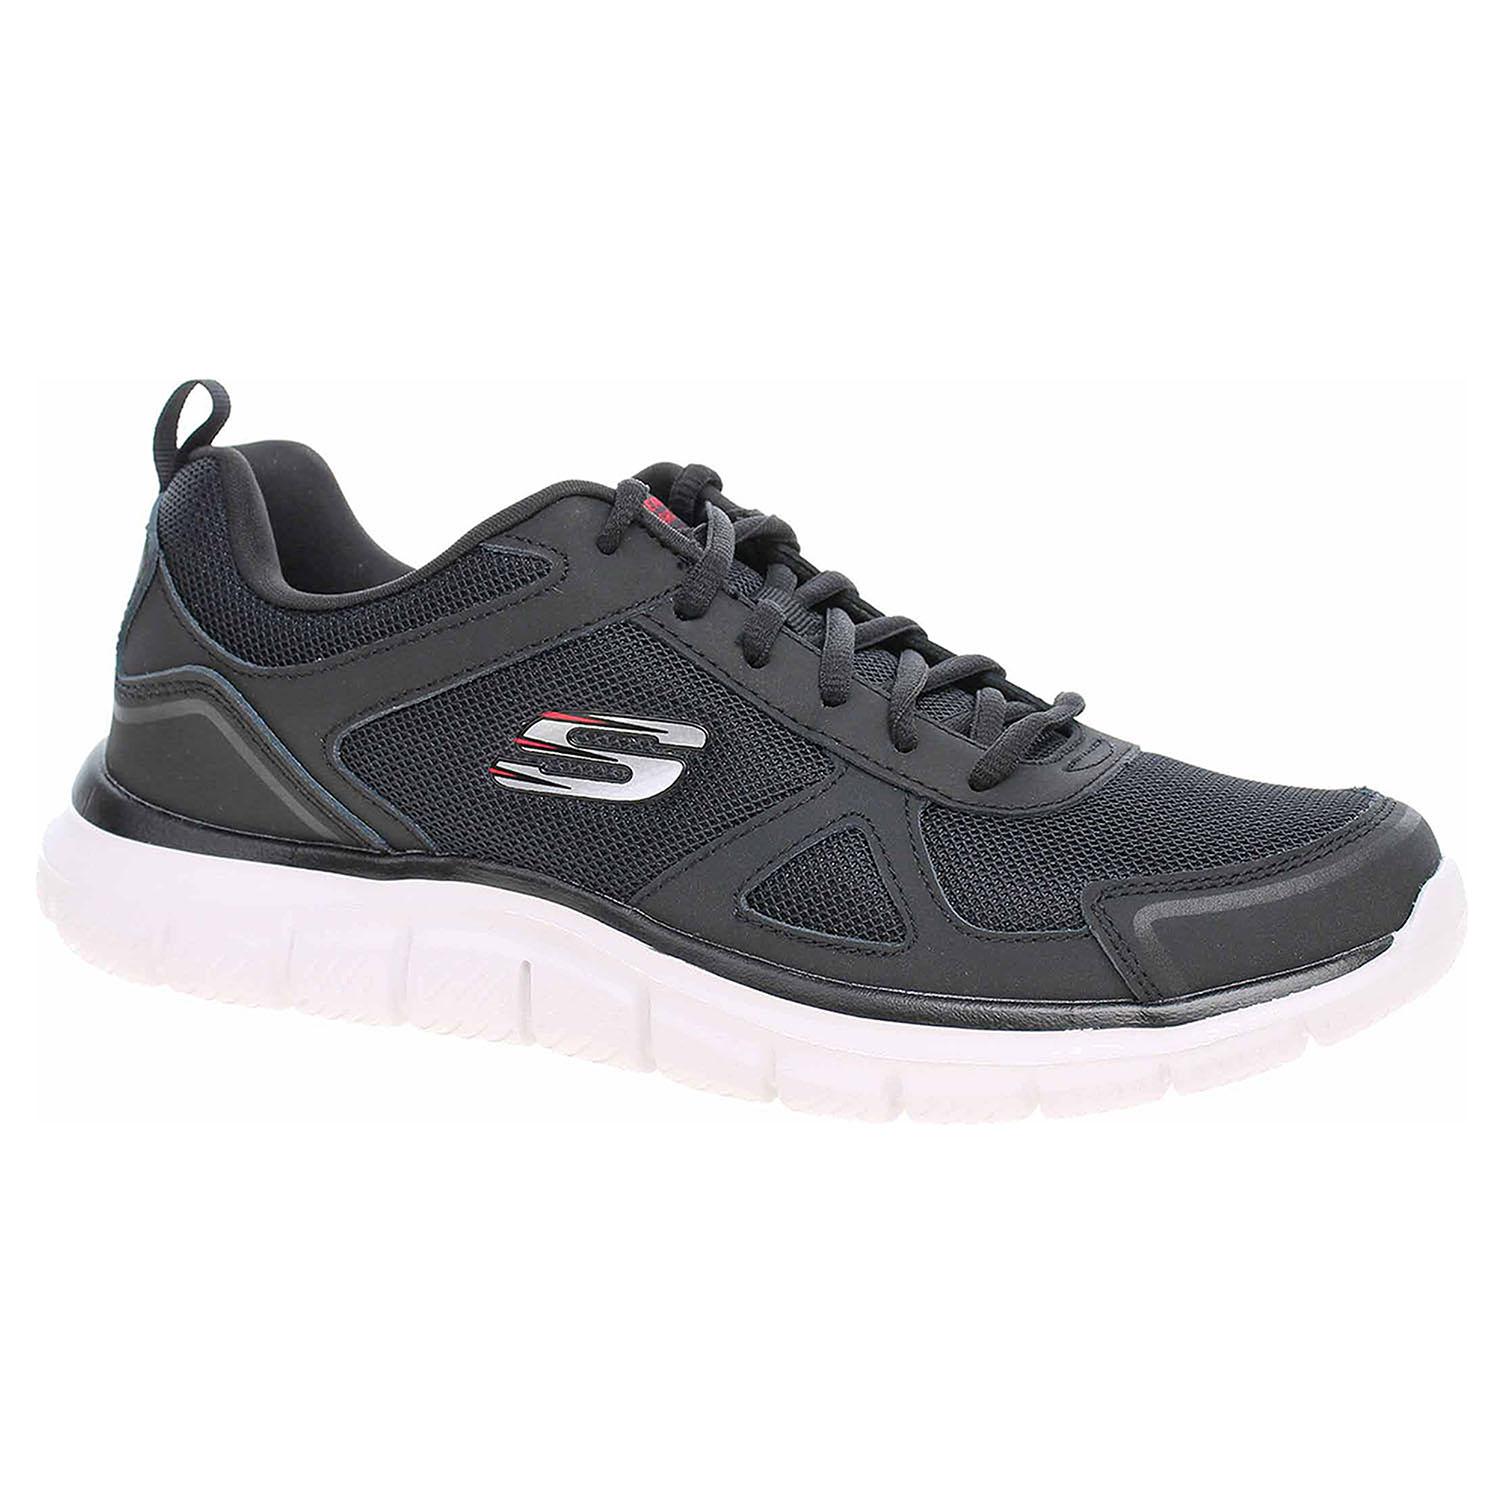 Skechers Track - Scloric black-red 52631 BKRD 42